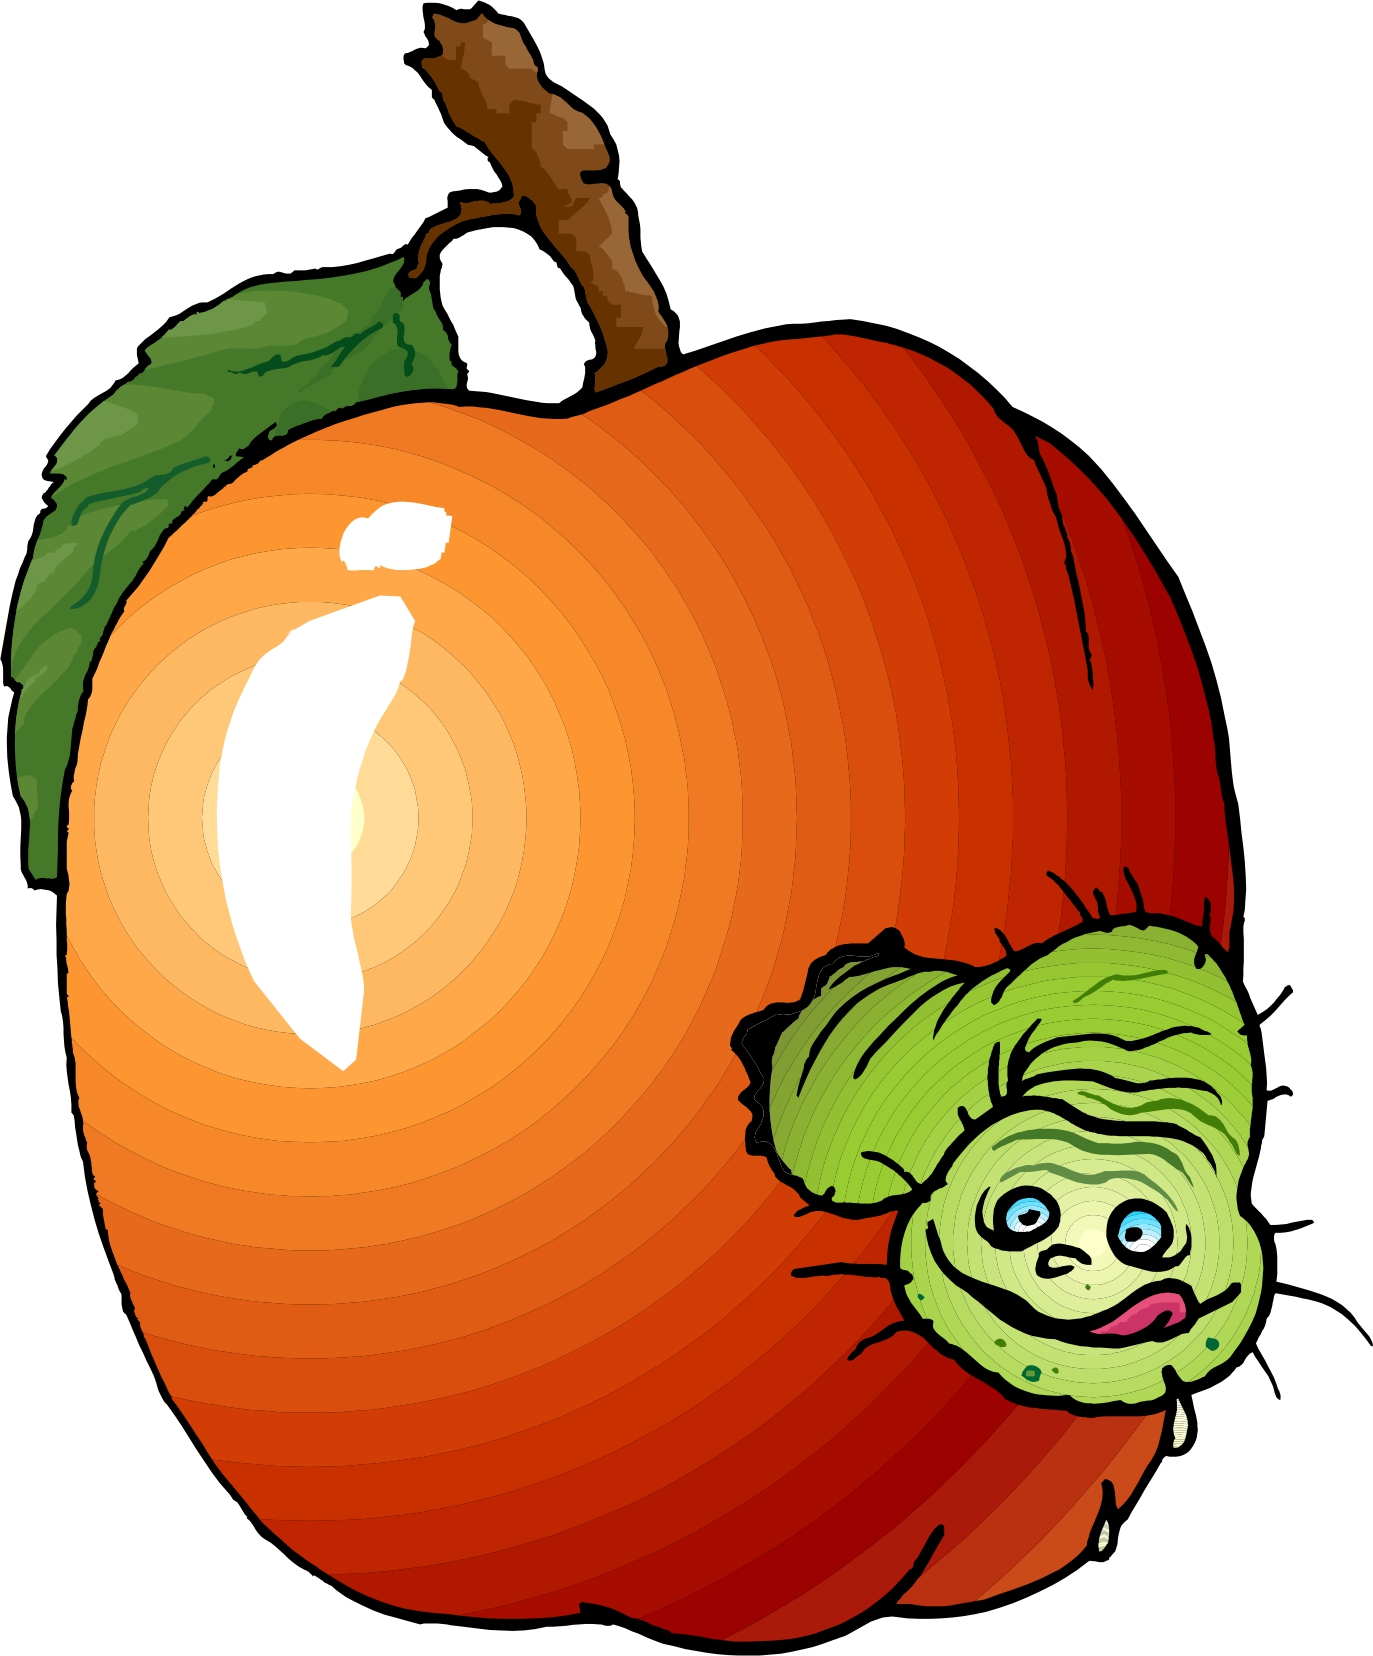 1373x1656 Apple Orchard Clipart Rotten Apple